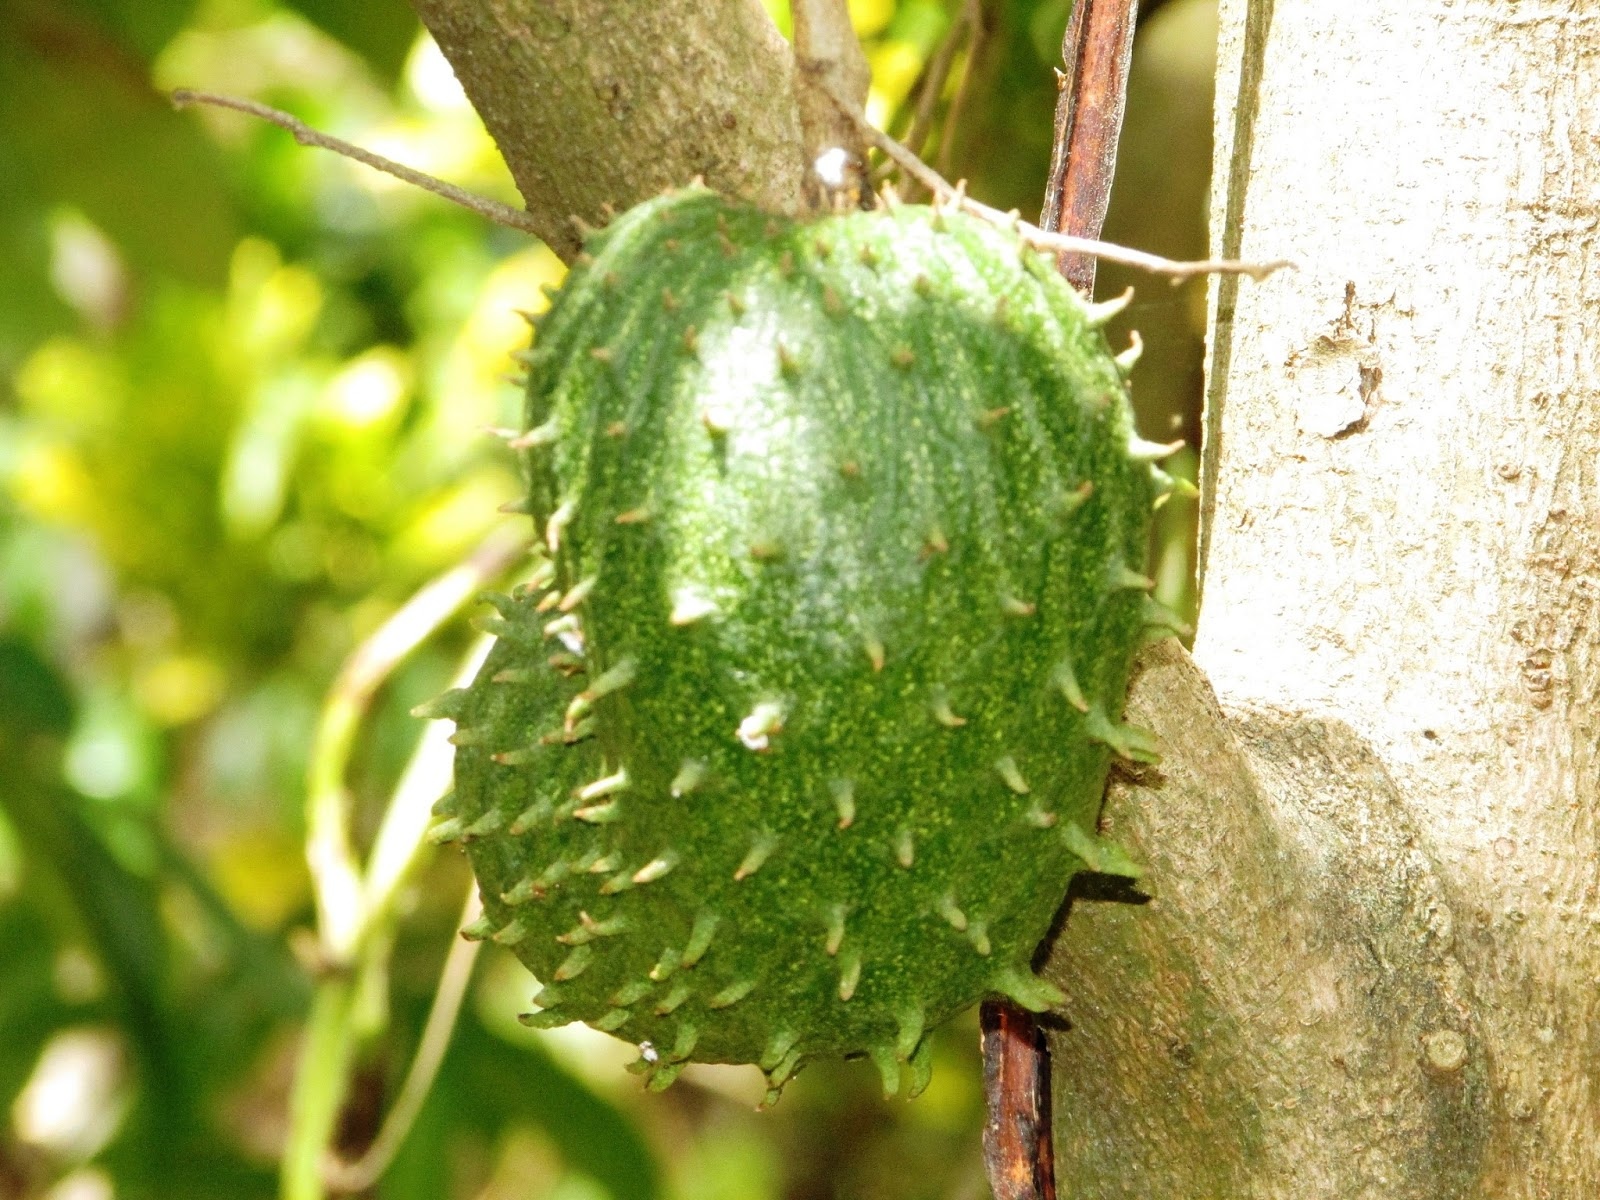 Sirsak, nangka belanda, atau durian belanda